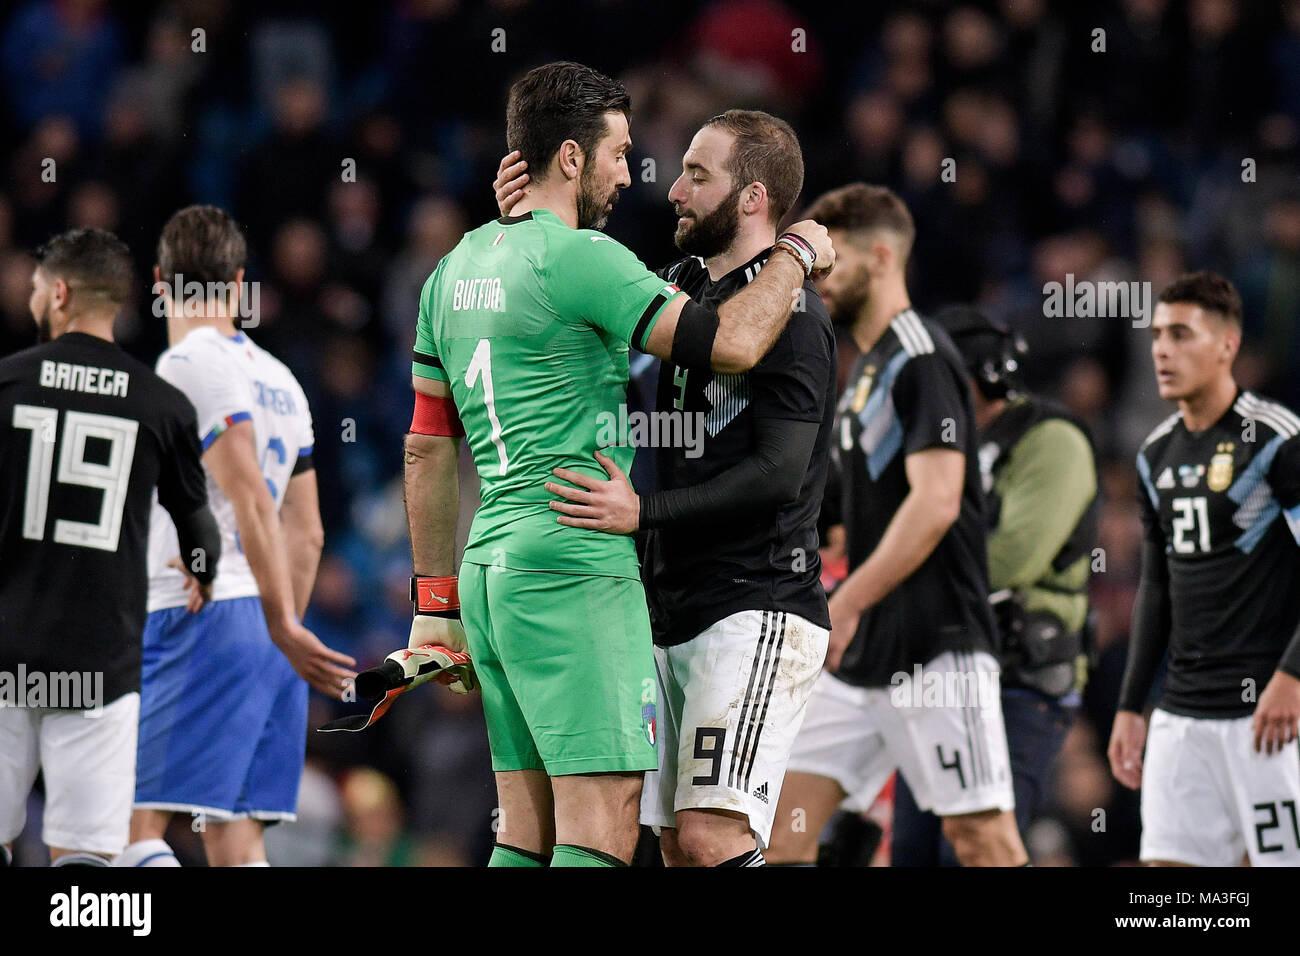 60c732c20d3e5 Gonzalo Higuain e Gianluigi Buffon London 23-3-2018 Etihad Stadium Football  friendly match Argentina - Italy Photo Federico Tardito   one+nine   Ins